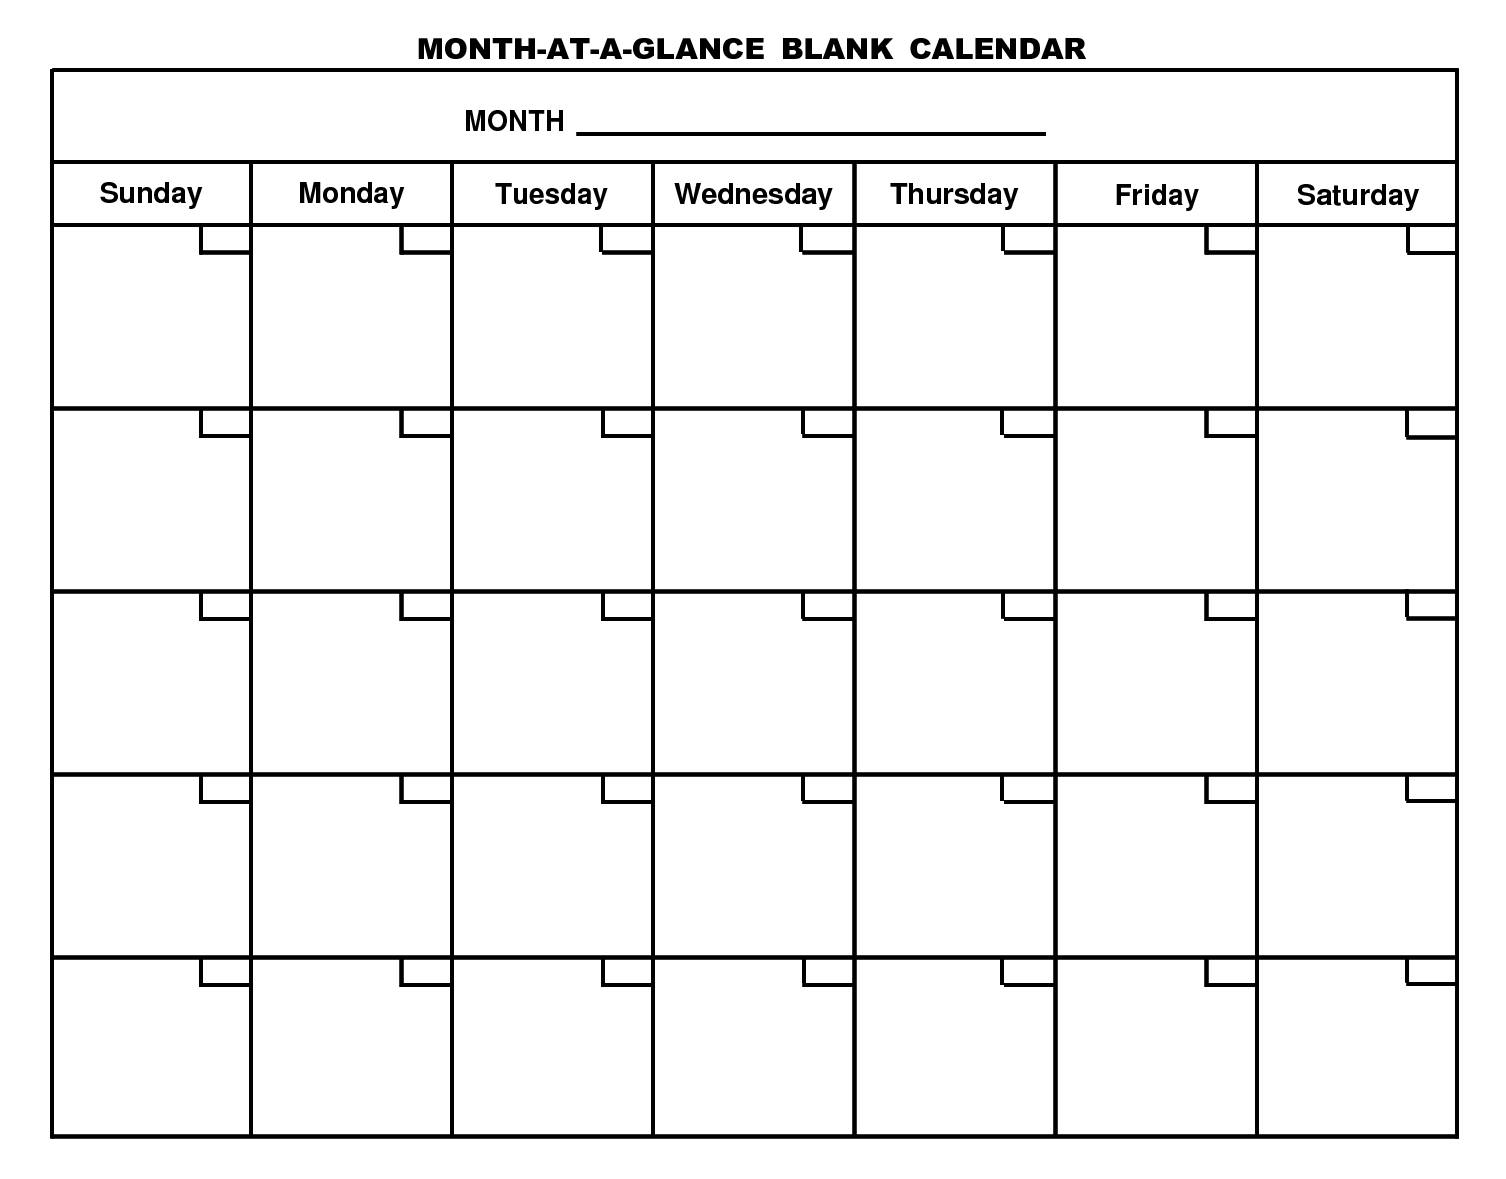 Free-Printable-Month-At-A-Glance-Blank-Calendar (1506